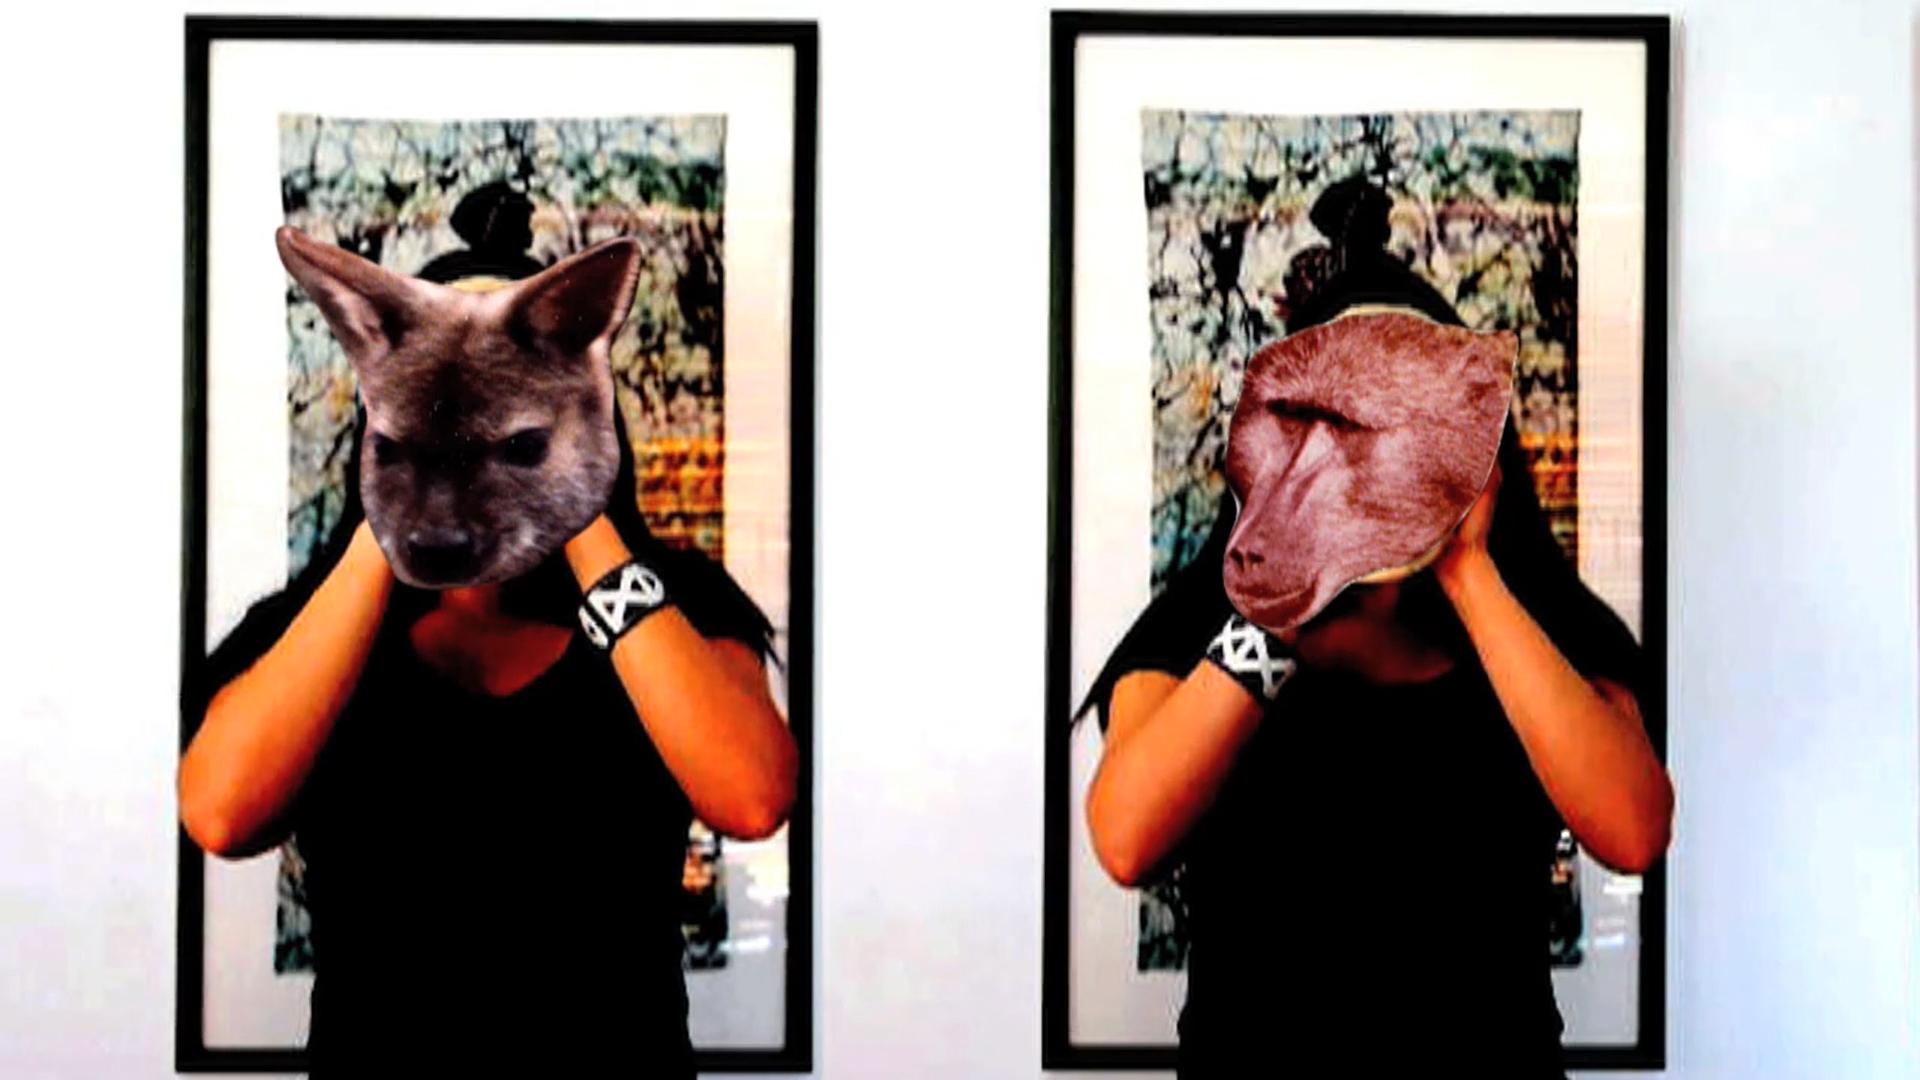 ©ISEA2016: 22nd International Symposium on Electronic Art, Amelia Johannes, Family Crockery (Whiteness) + Signifiers of Ritual Mask (Animals) + Planting Ritual, Video Artworks 2011–2013